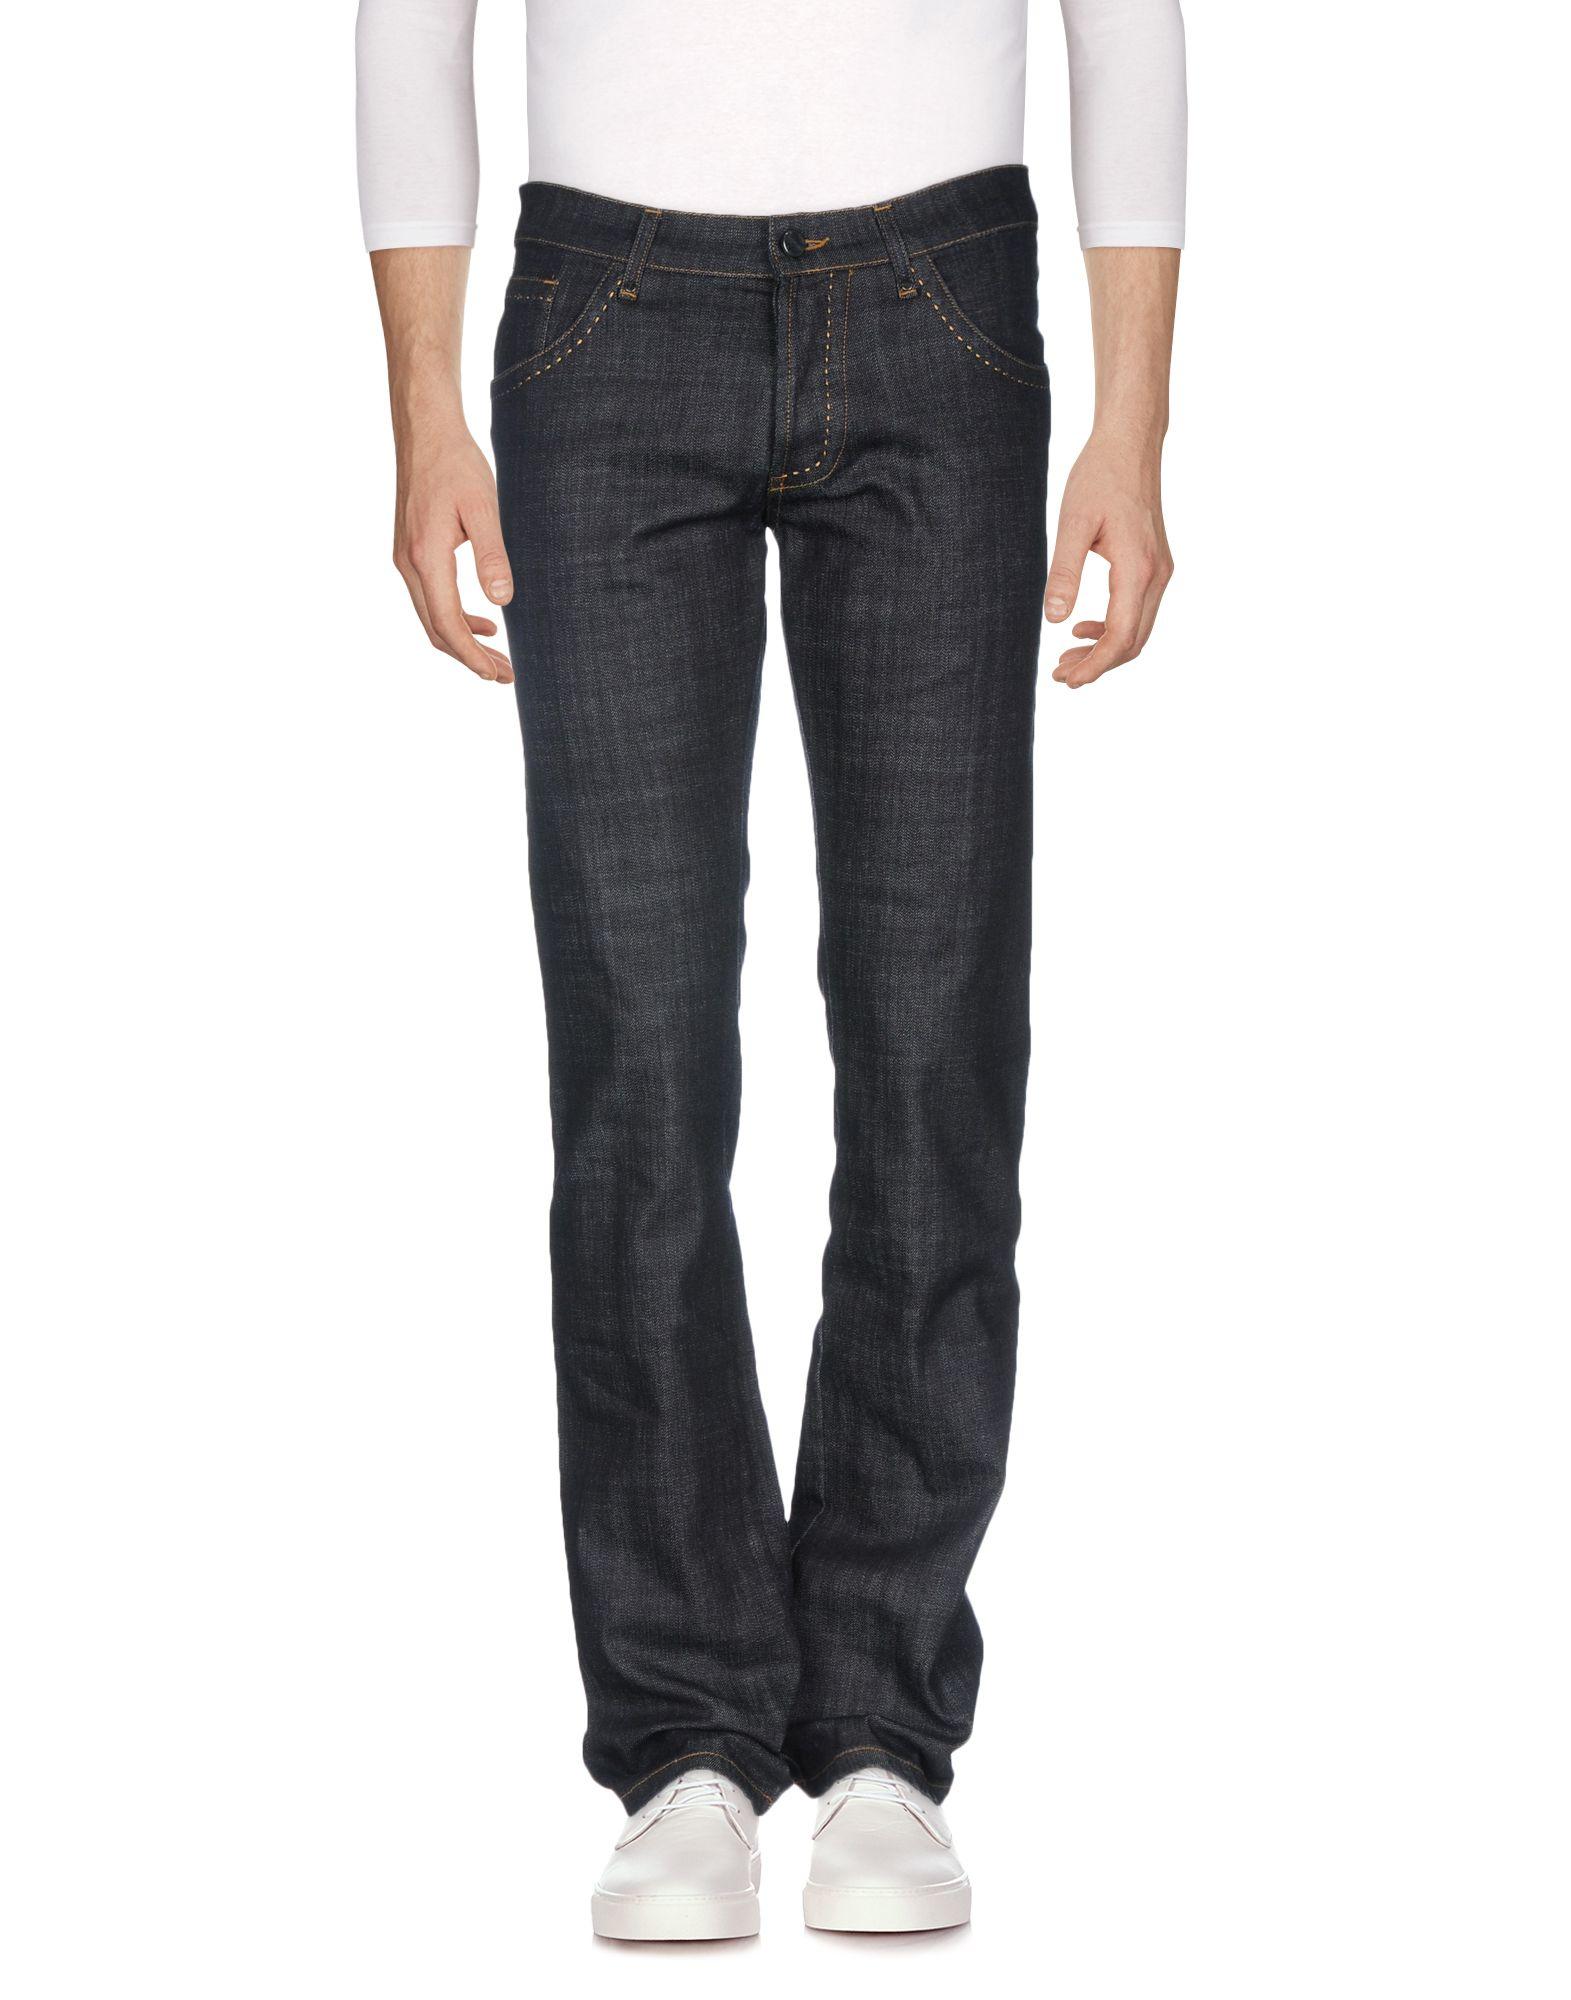 Pantaloni Jeans Gianni Versace Couture Uomo - Acquista online su